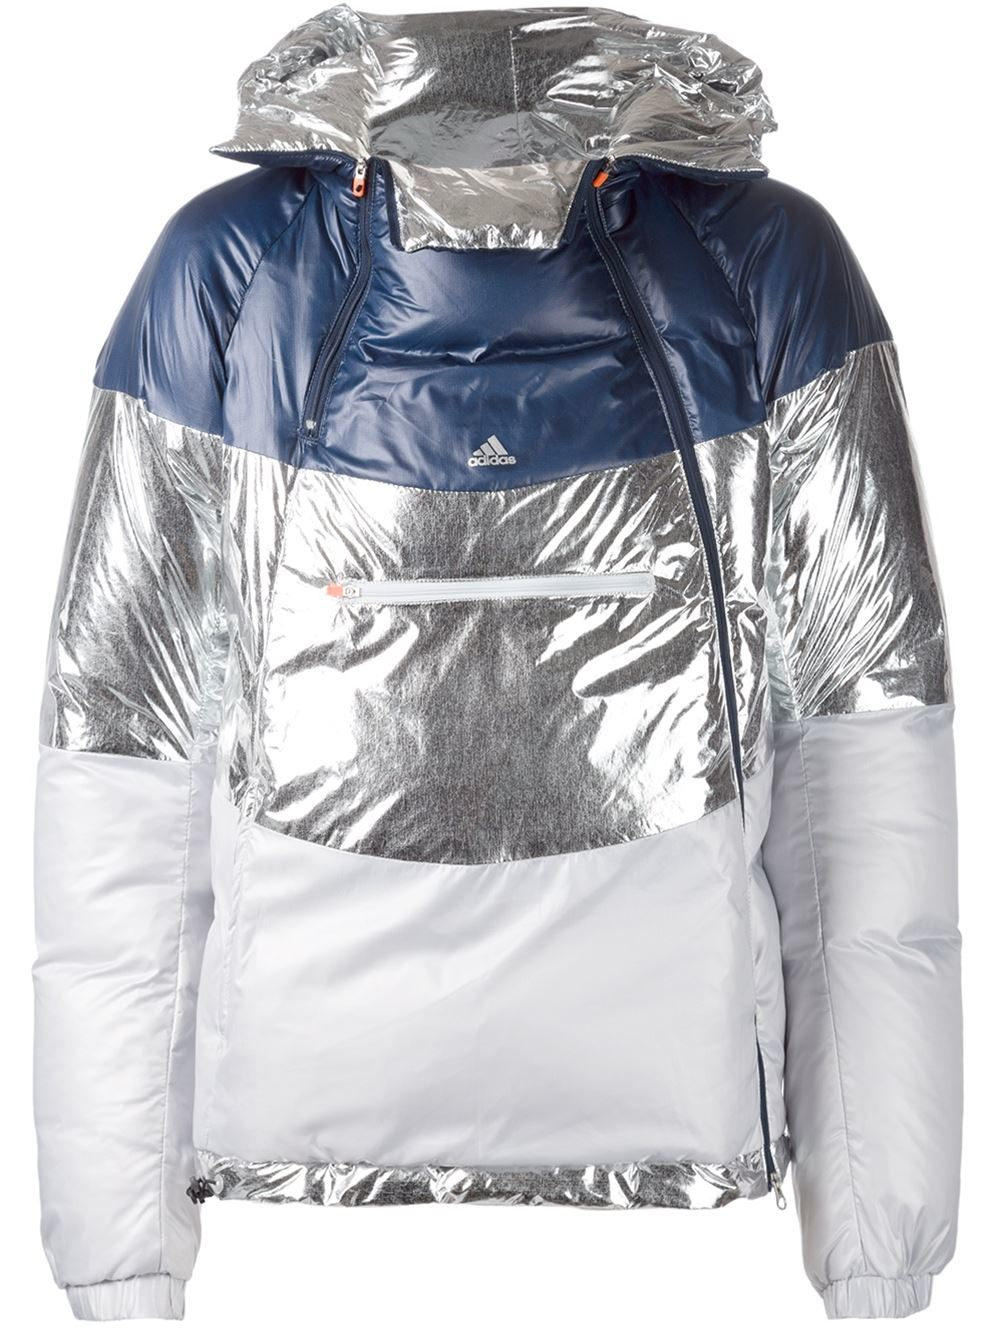 59c0d3609 adidas Originals Adidas By Kolor Padded Jacket in Metallic for Men ...